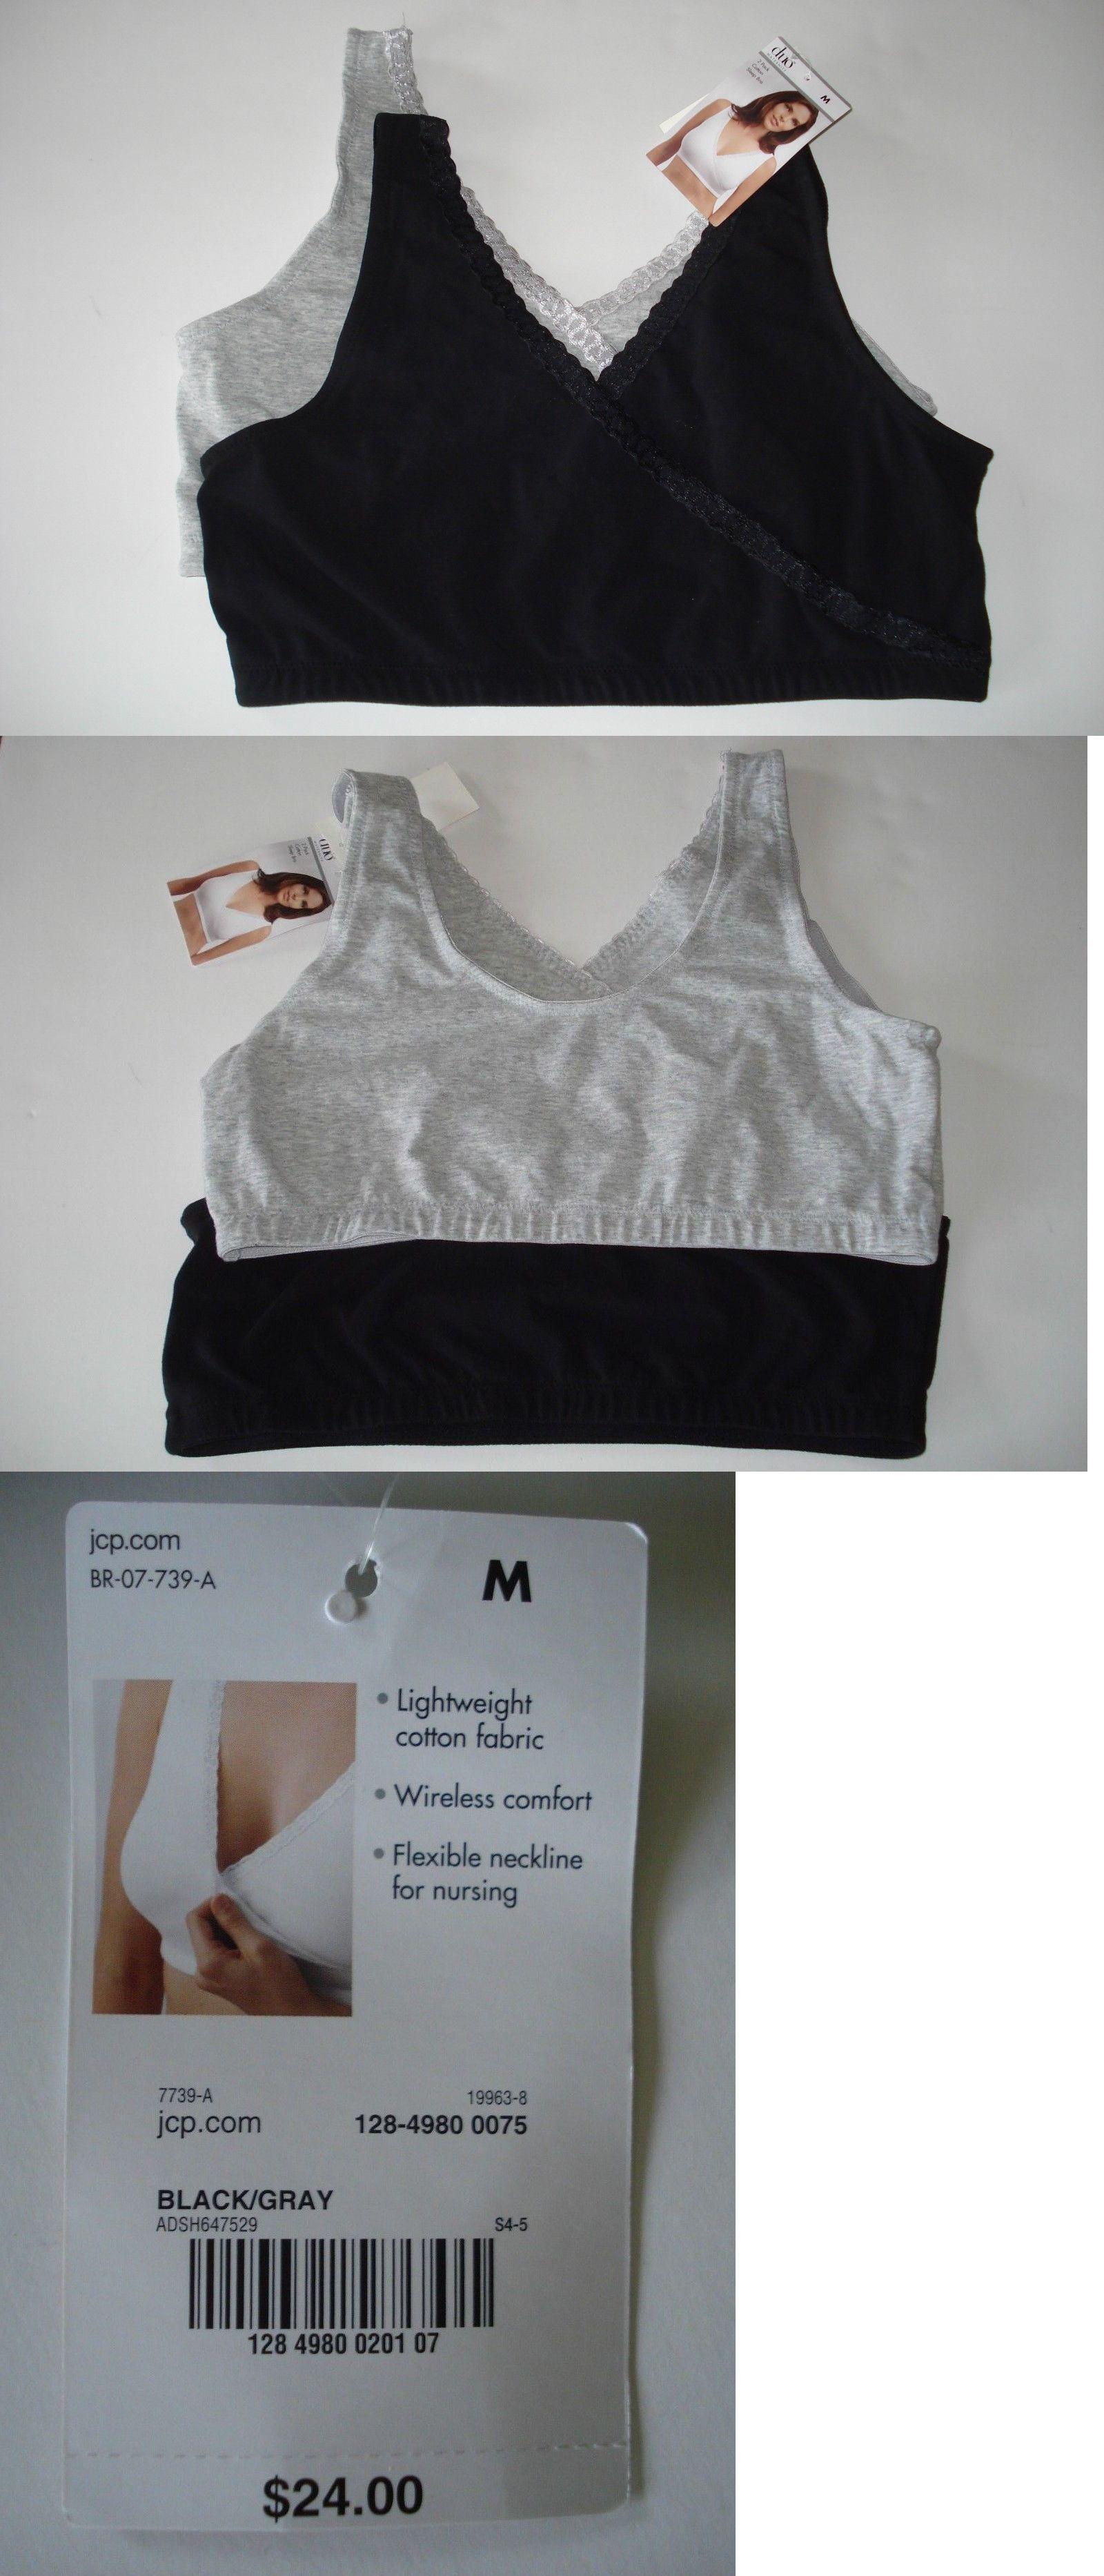 42b8d47627 Bras 11517  Duo Maternity 2 Pack Sleep Bra Nursing Cotton Black And Gray  Size Medium